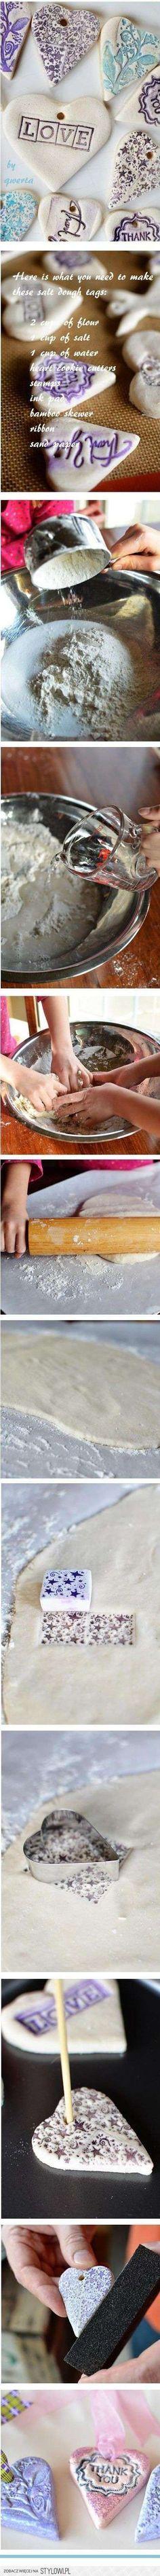 Coole Anhànger aus Salzteig